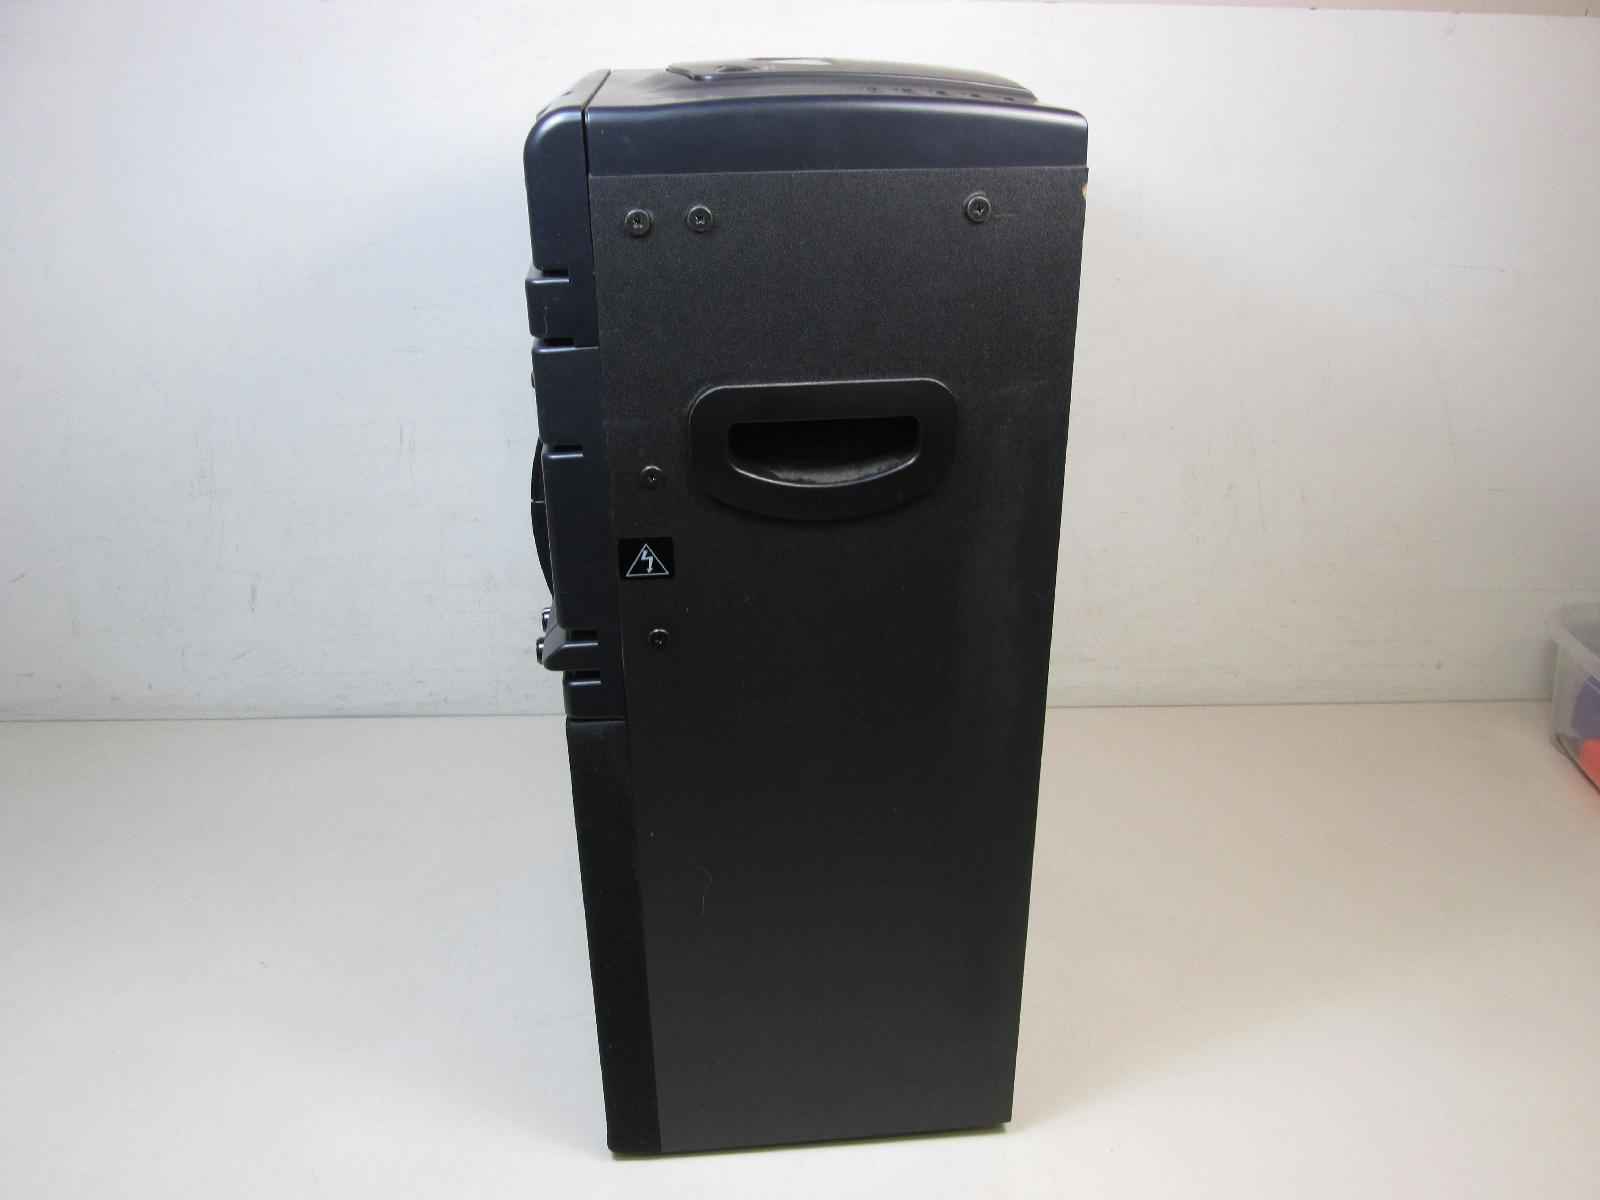 vocopro dvd duet karaoke machine bundle soft case partially tested ebay. Black Bedroom Furniture Sets. Home Design Ideas